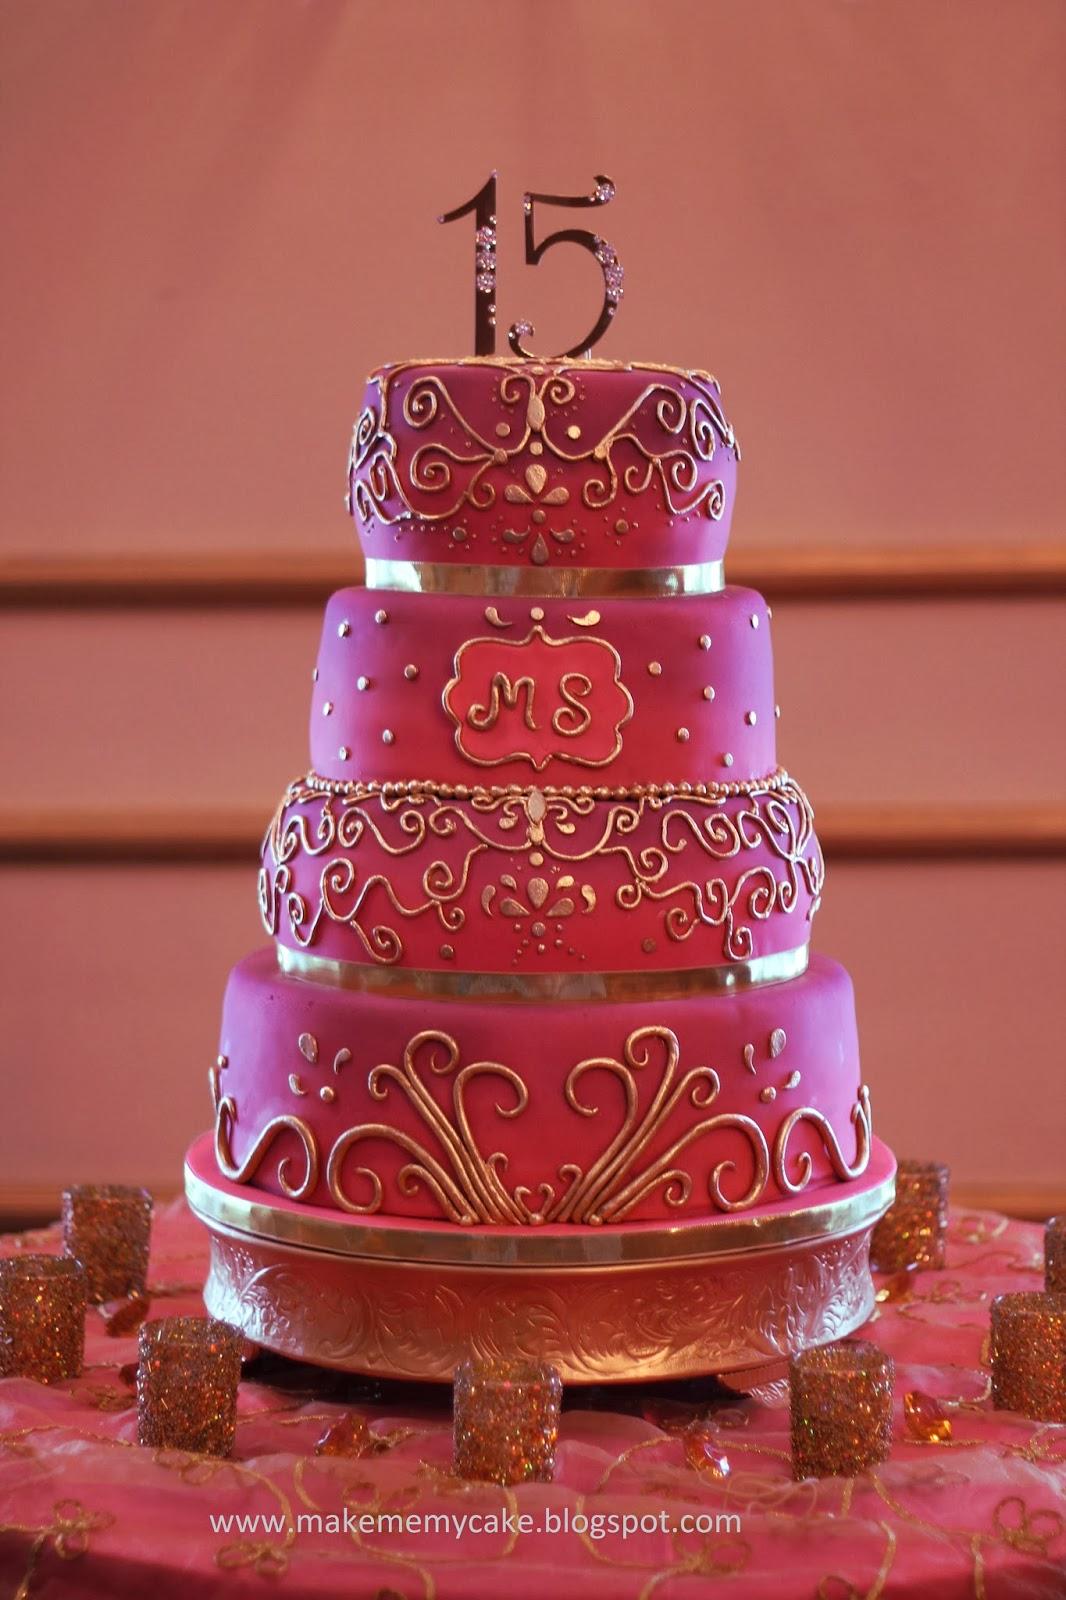 Make Me My Cake Top 10 Cakes Of 2013